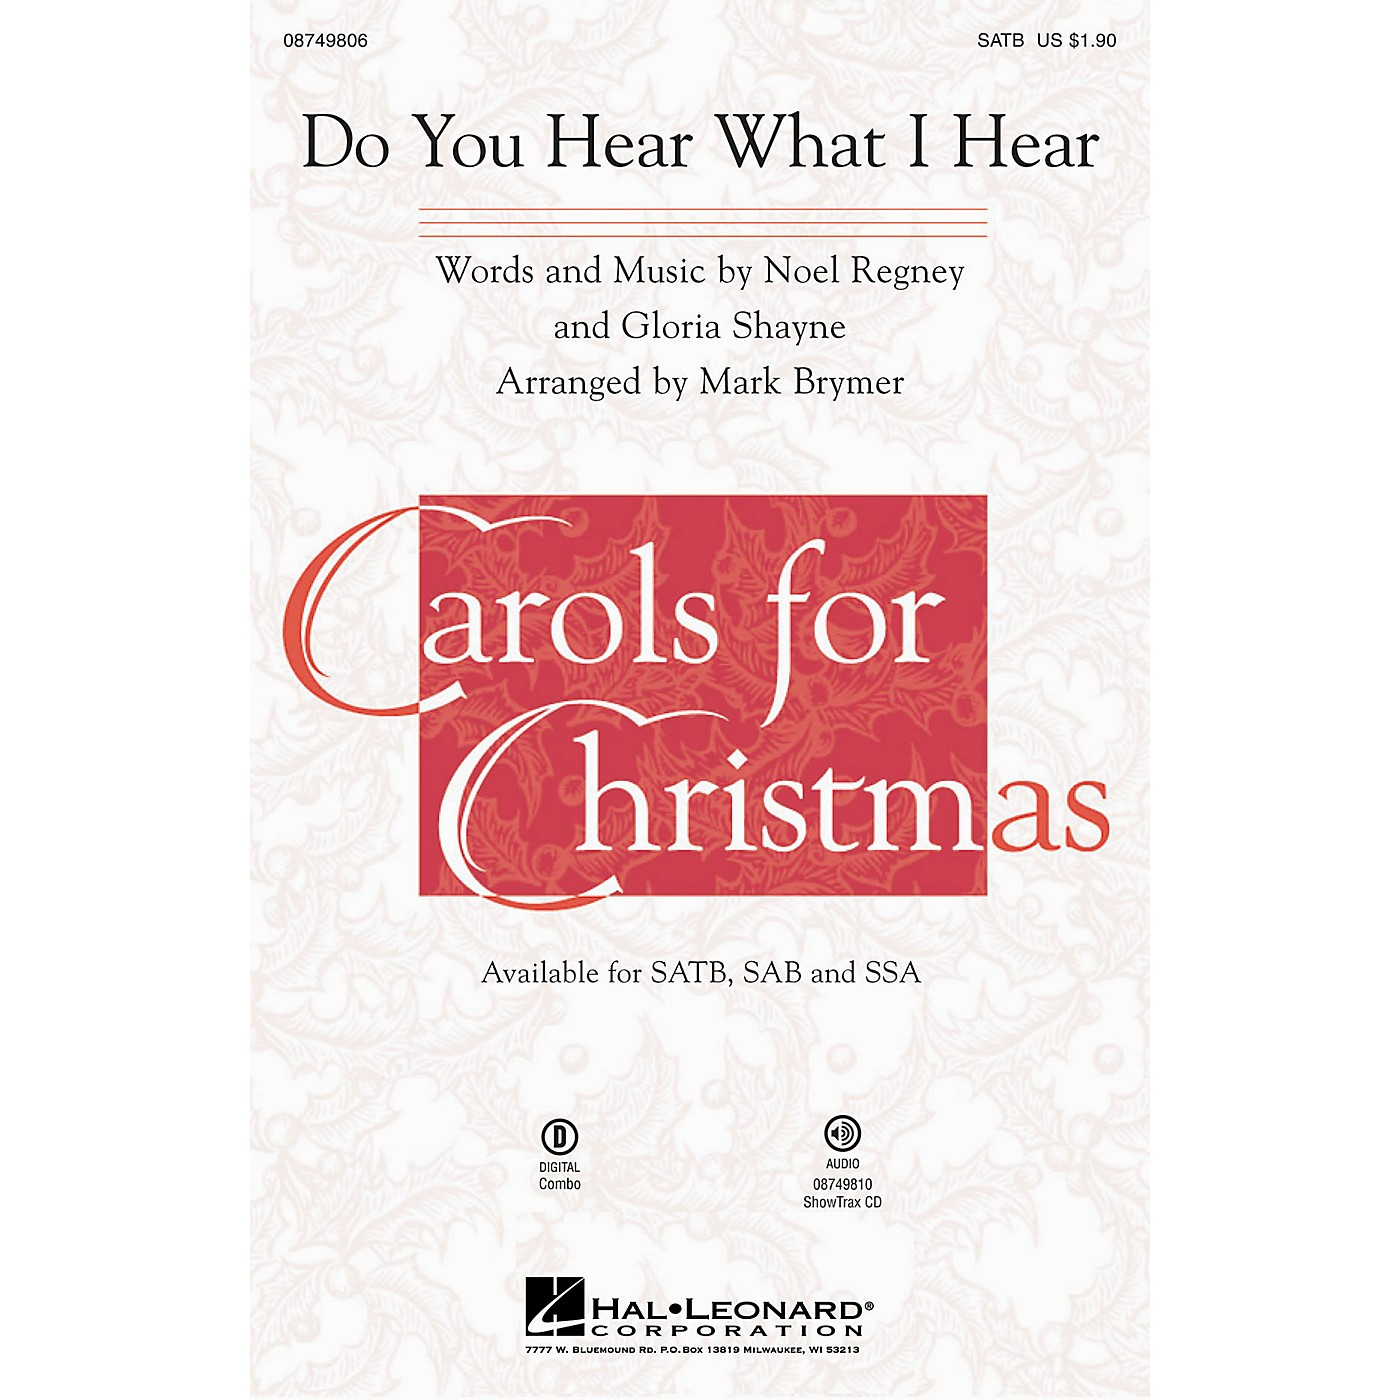 Hal Leonard Do You Hear What I Hear? SATB arranged by Mark Brymer thumbnail